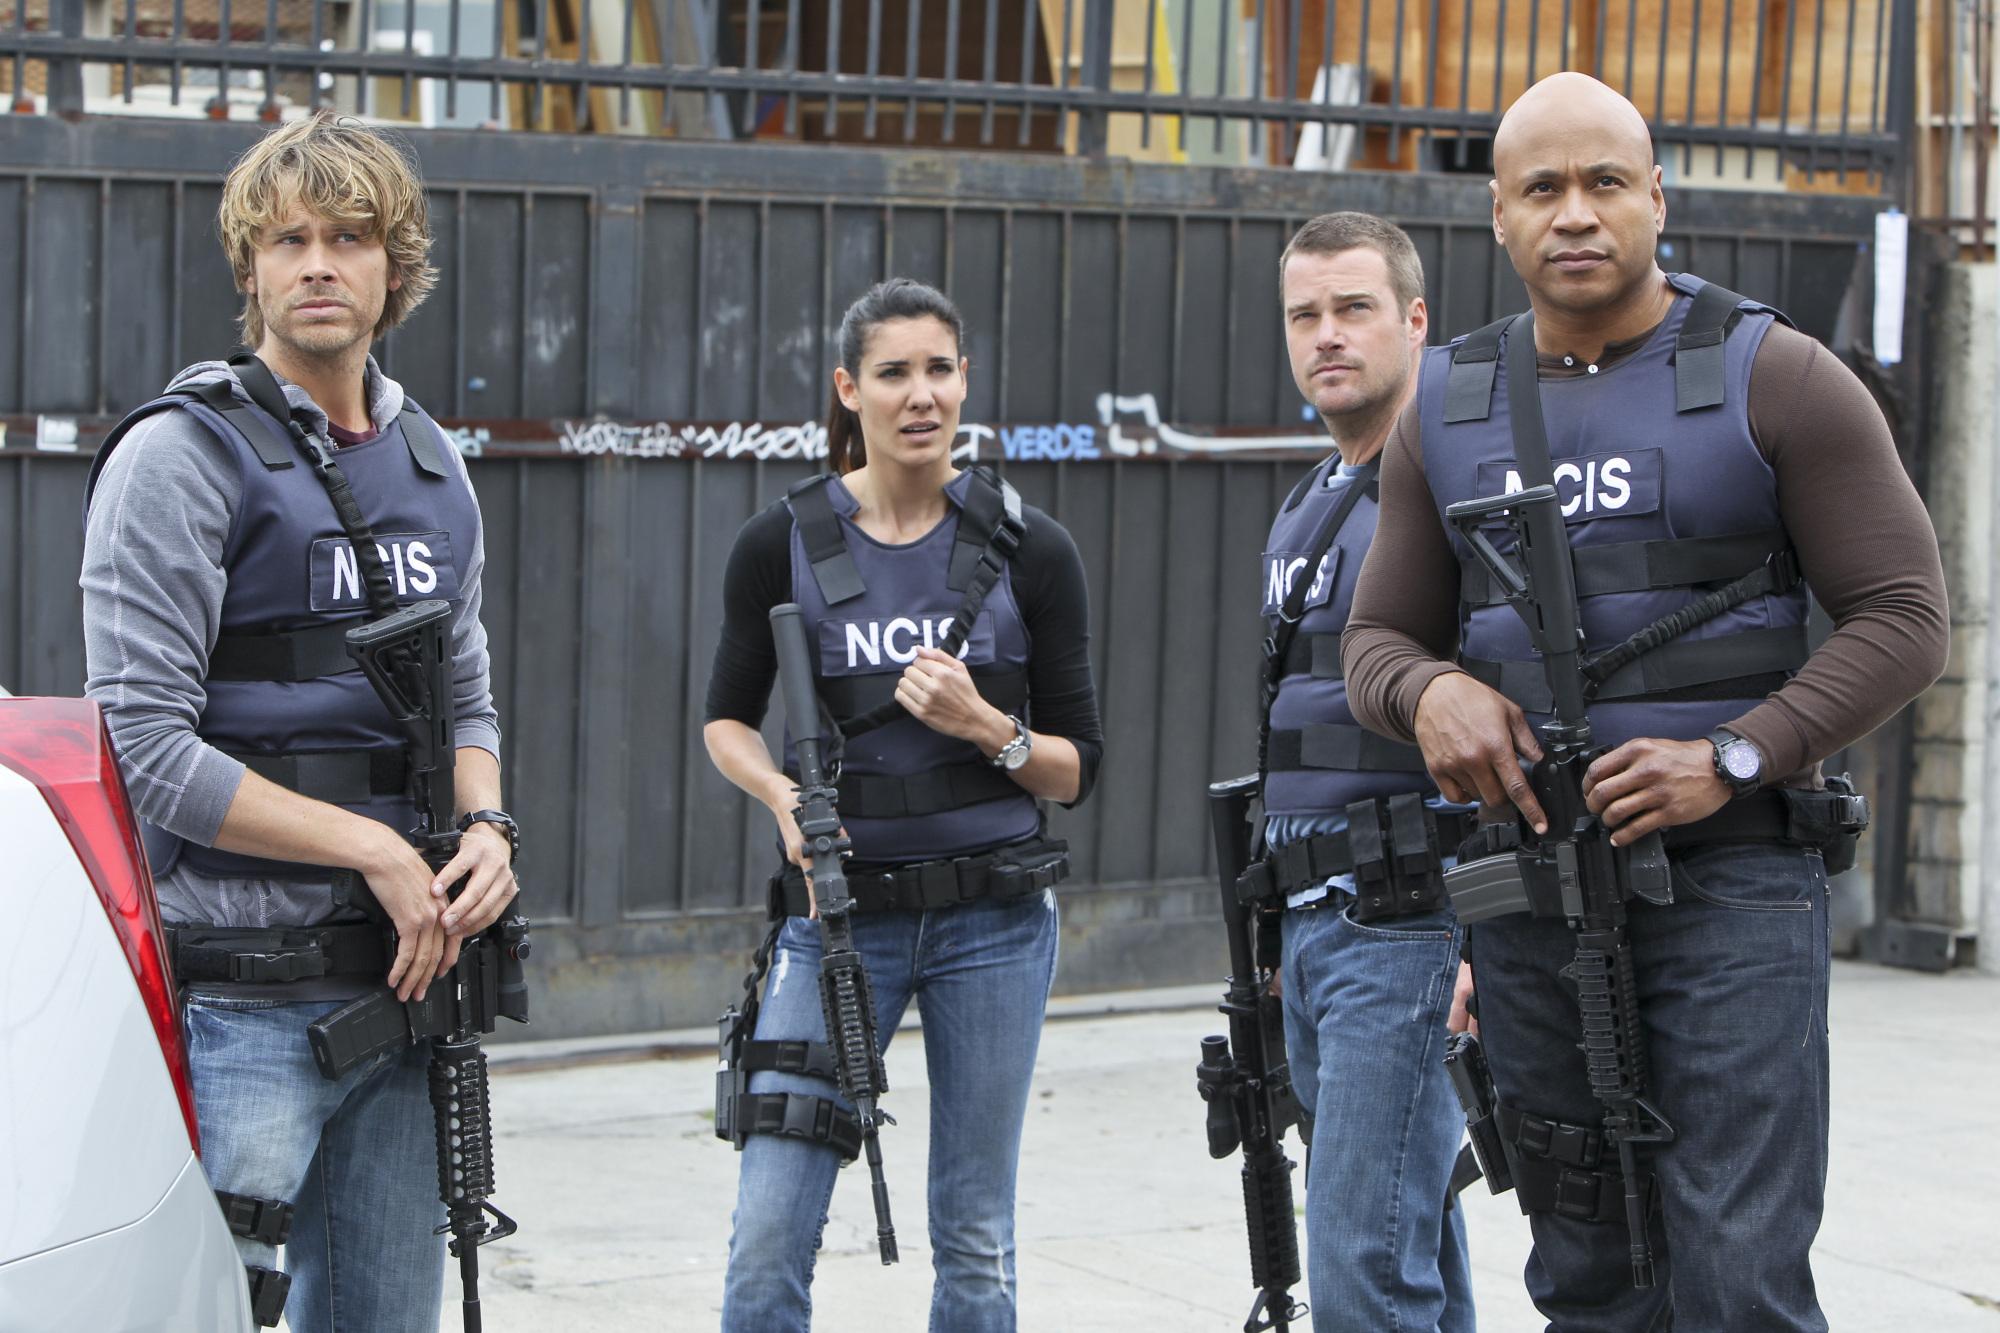 Ncis La: NCIS: Los Angeles HD Wallpaper